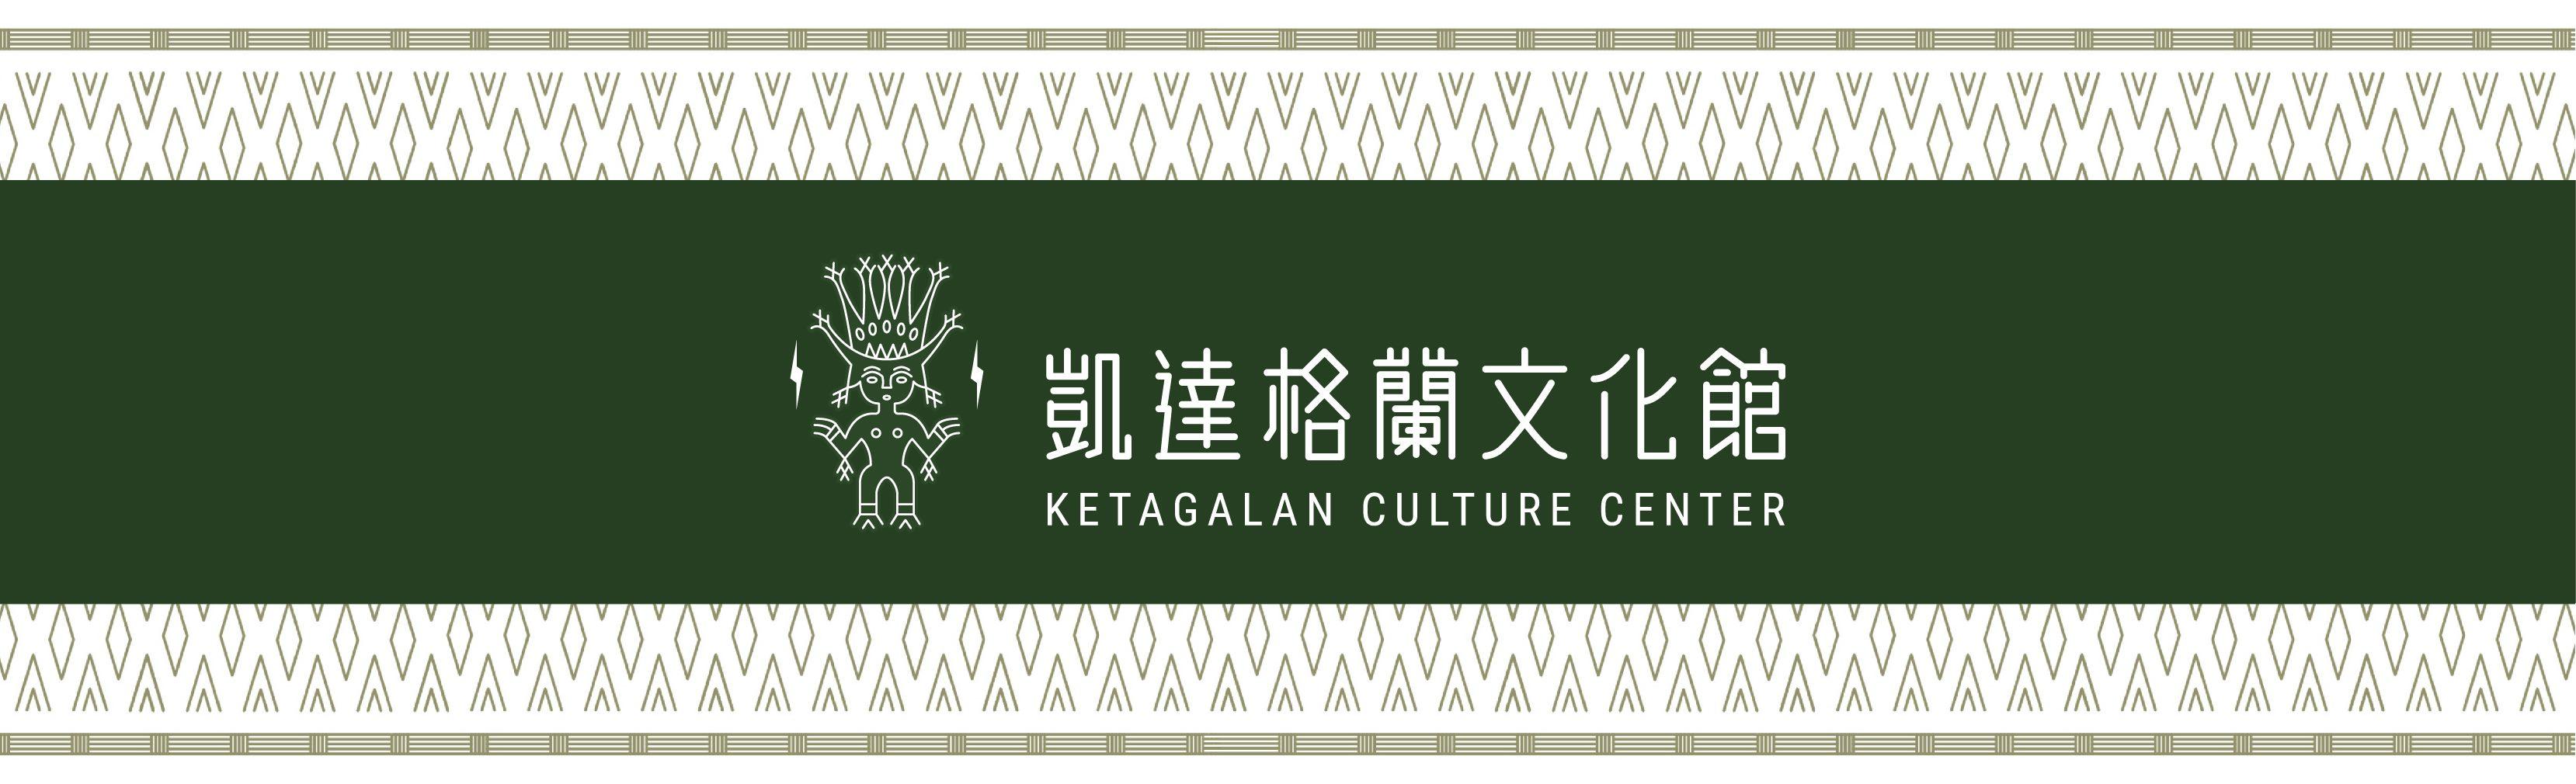 Ketagalan Banner